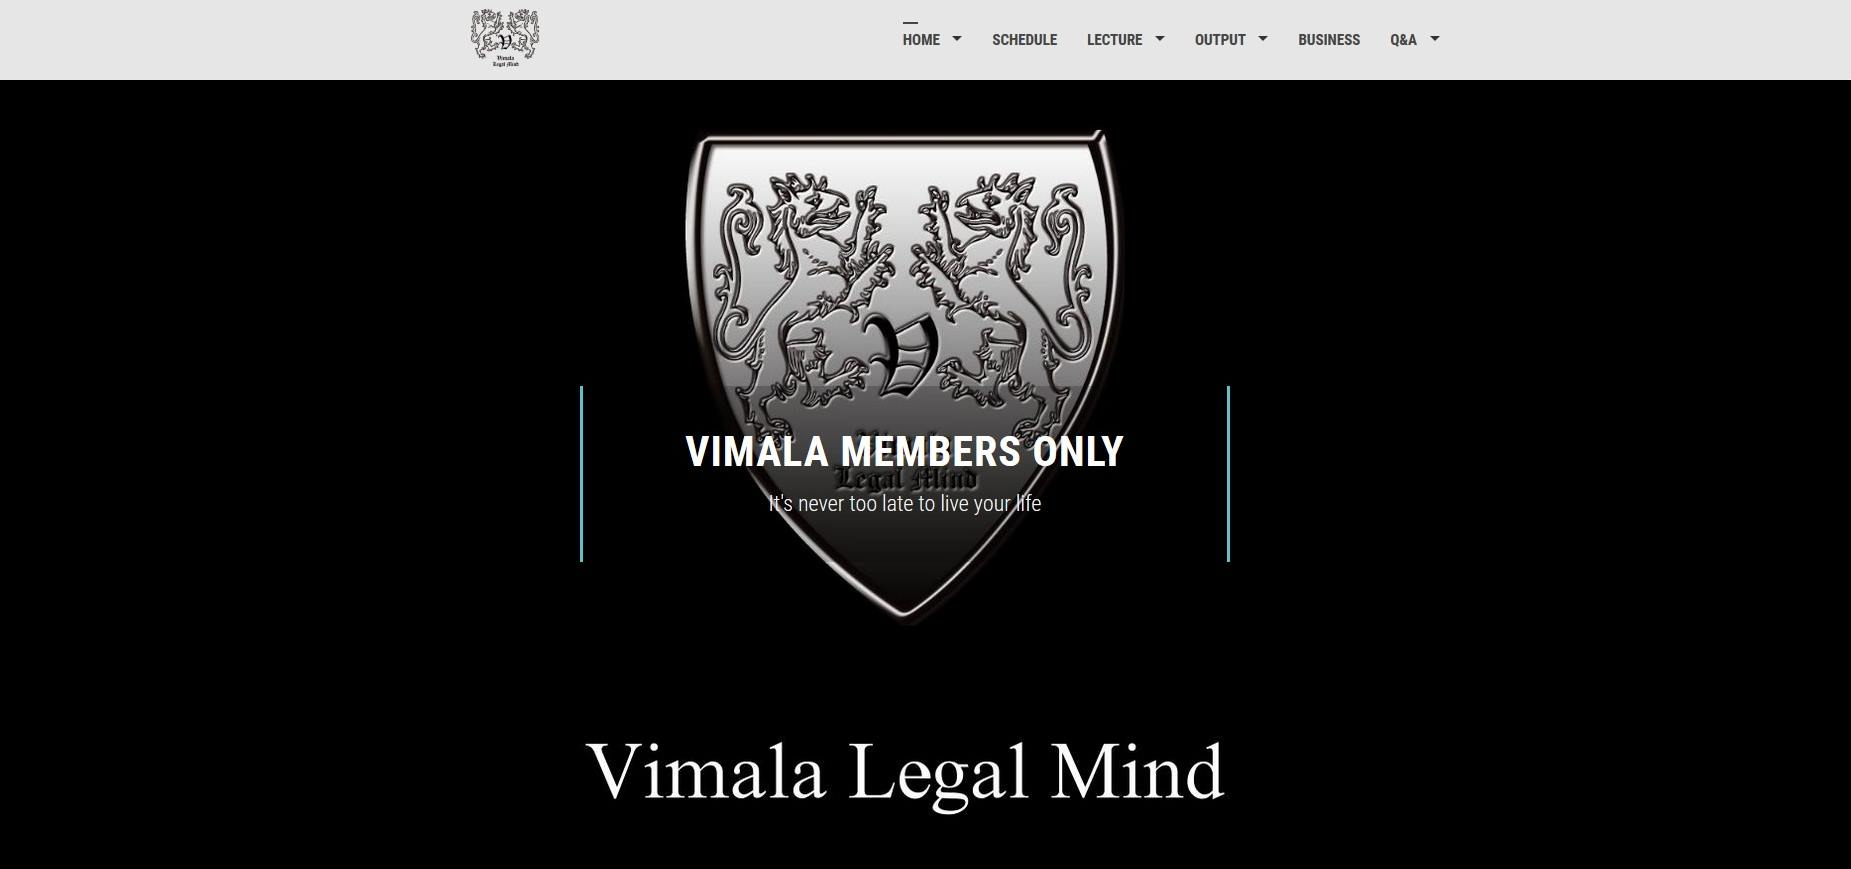 Vimala塾のサイト構成は?